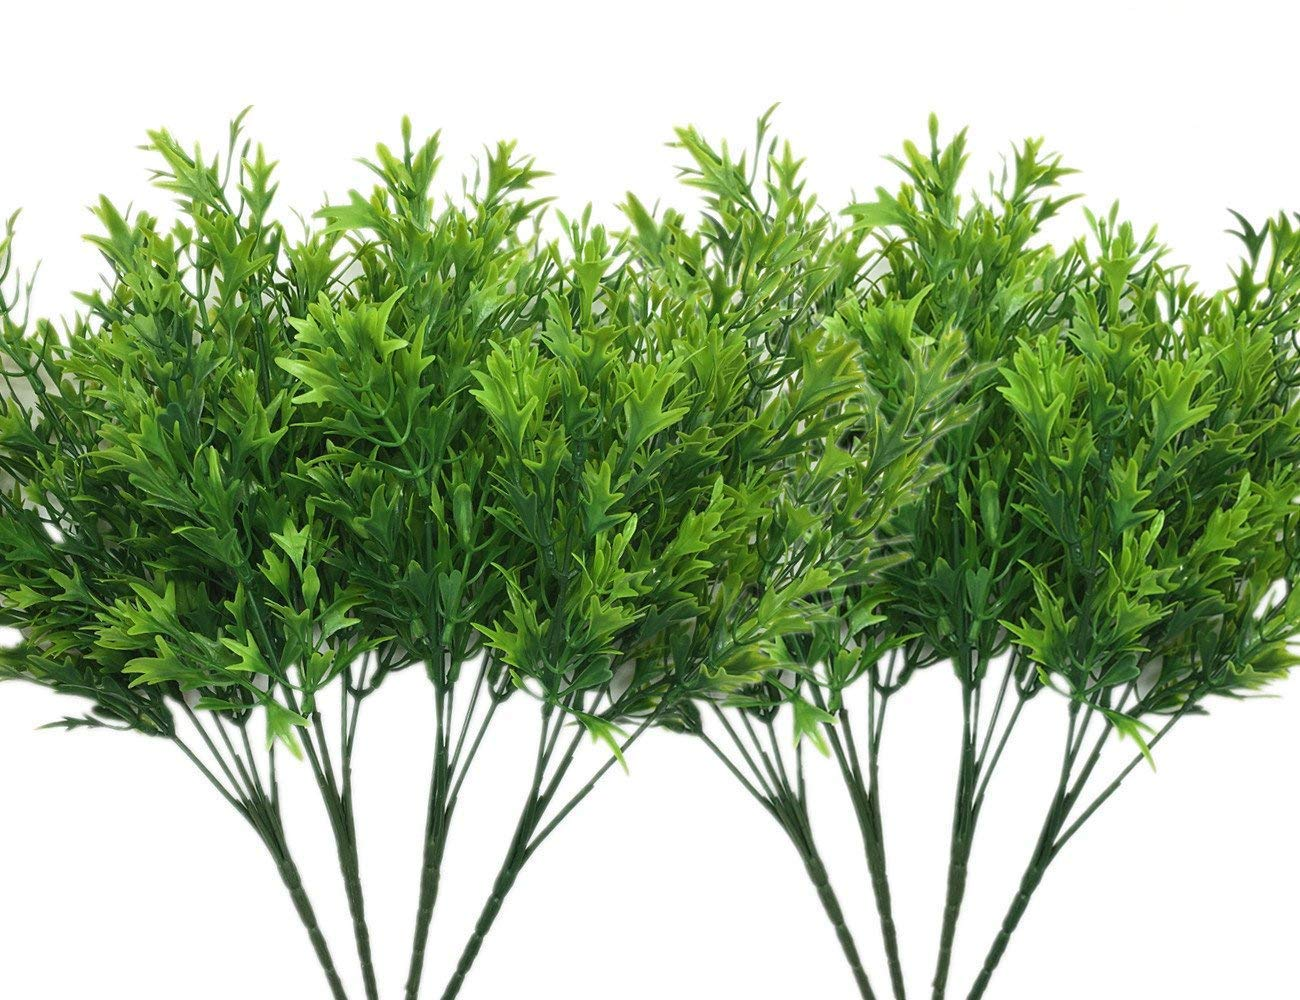 LoveniMen Artificial Shrubs, Plastic Plants Chrysanthemum Leaves Grass Simulation Fake Bushes Outdoor Indoor Home Garden Verandah Kitchen Parterre Table Centerpieces Arrangements Decoration Green 8pcs by LoveniMen (Image #1)